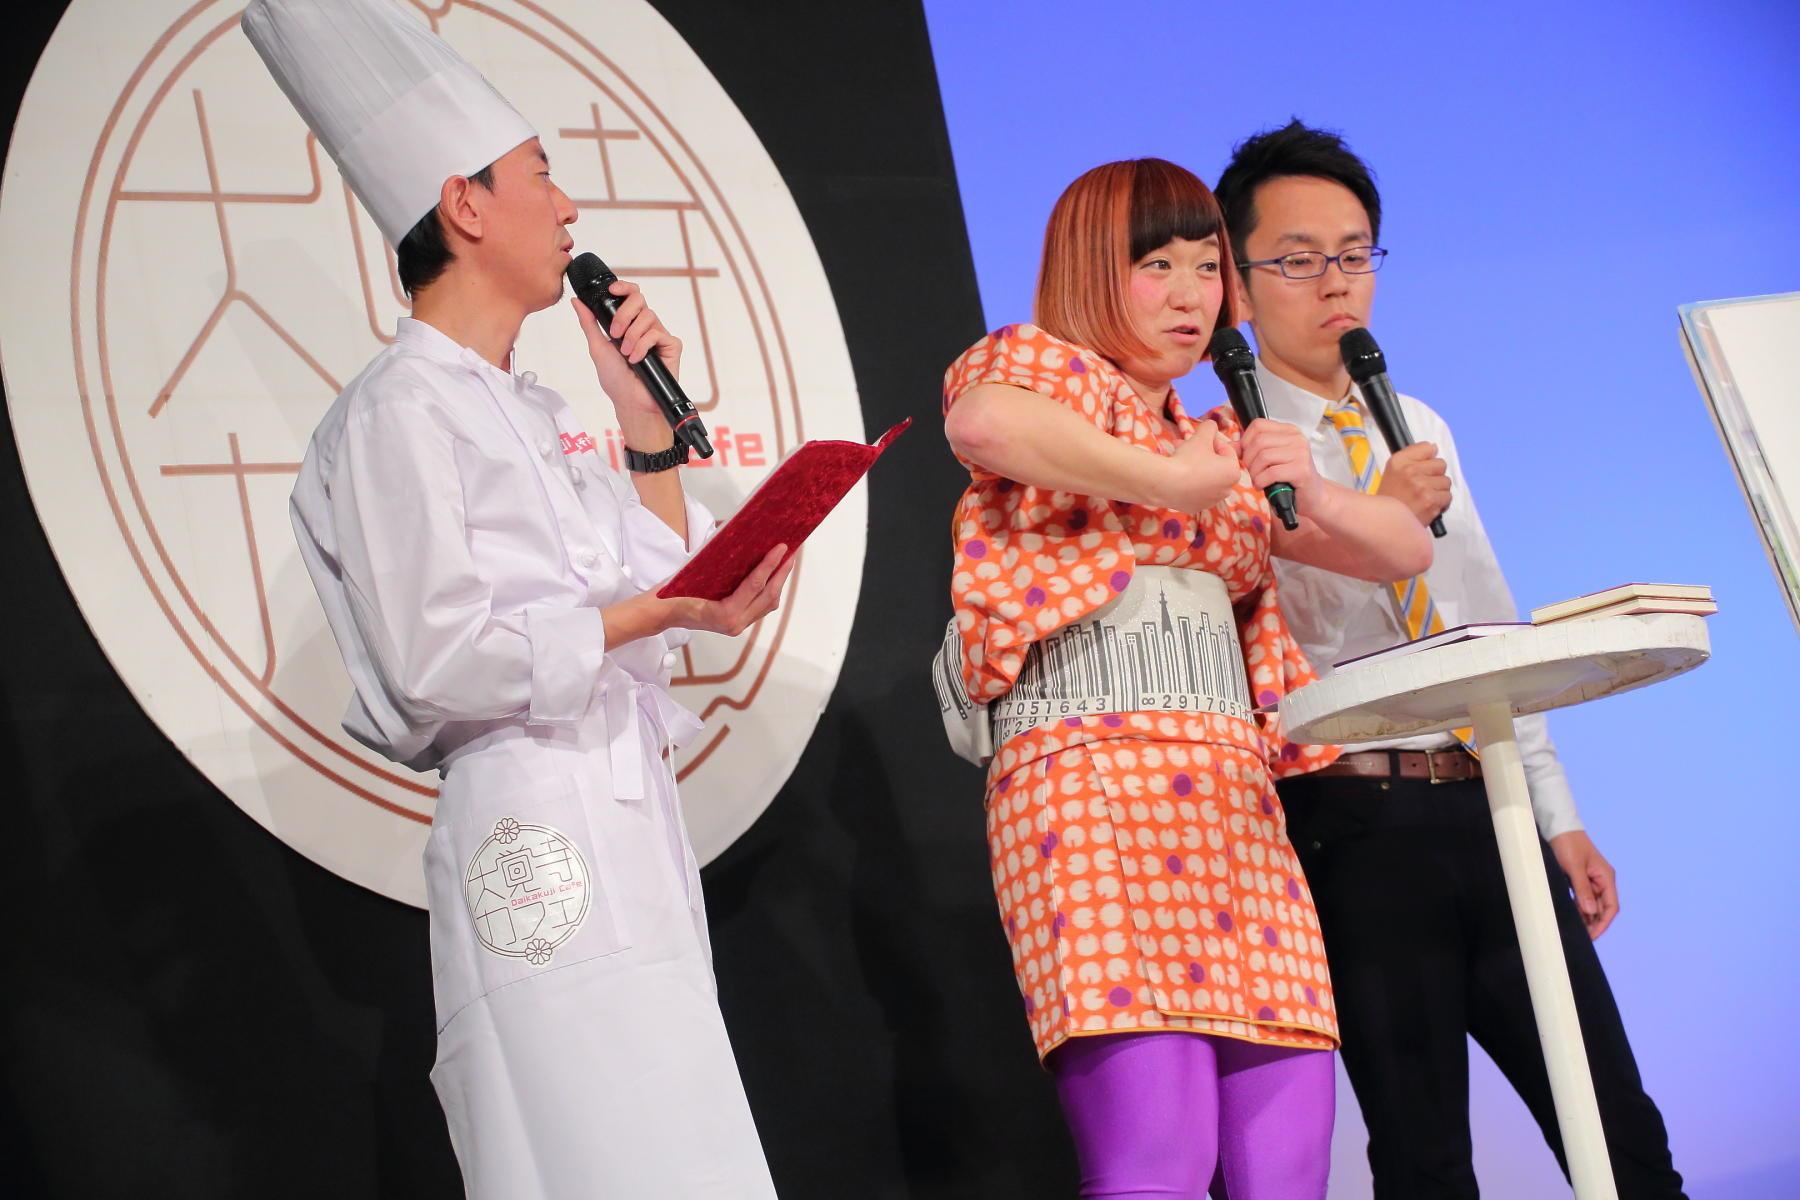 http://news.yoshimoto.co.jp/20170316063909-7635e74d21a759427e22670a8009d993c7db40aa.jpg